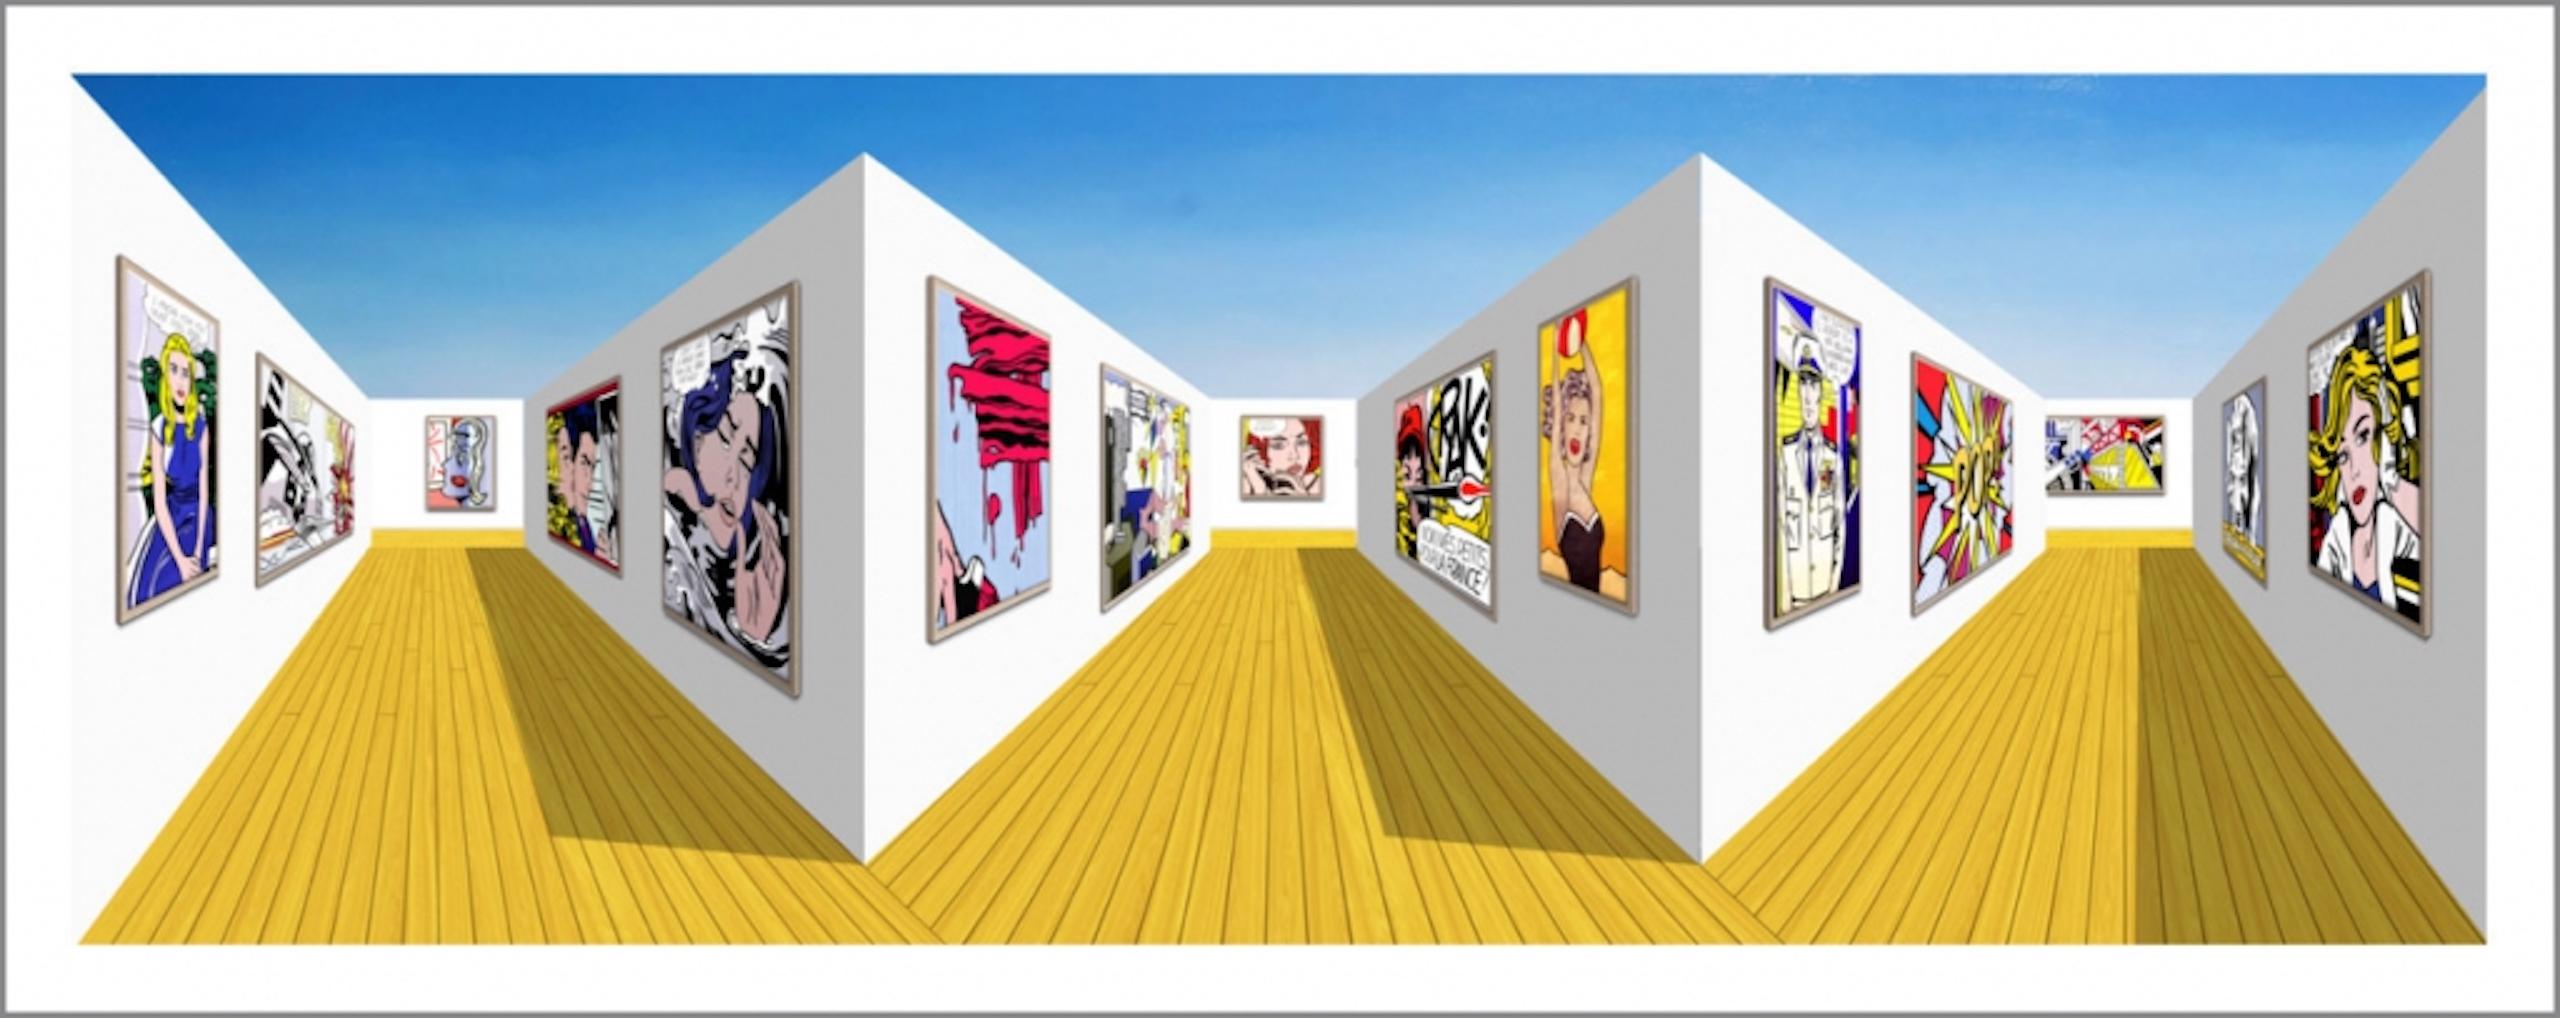 MAYBE (Roy gallery) (2020) 92 x 39 x 19 cm, Mixed media